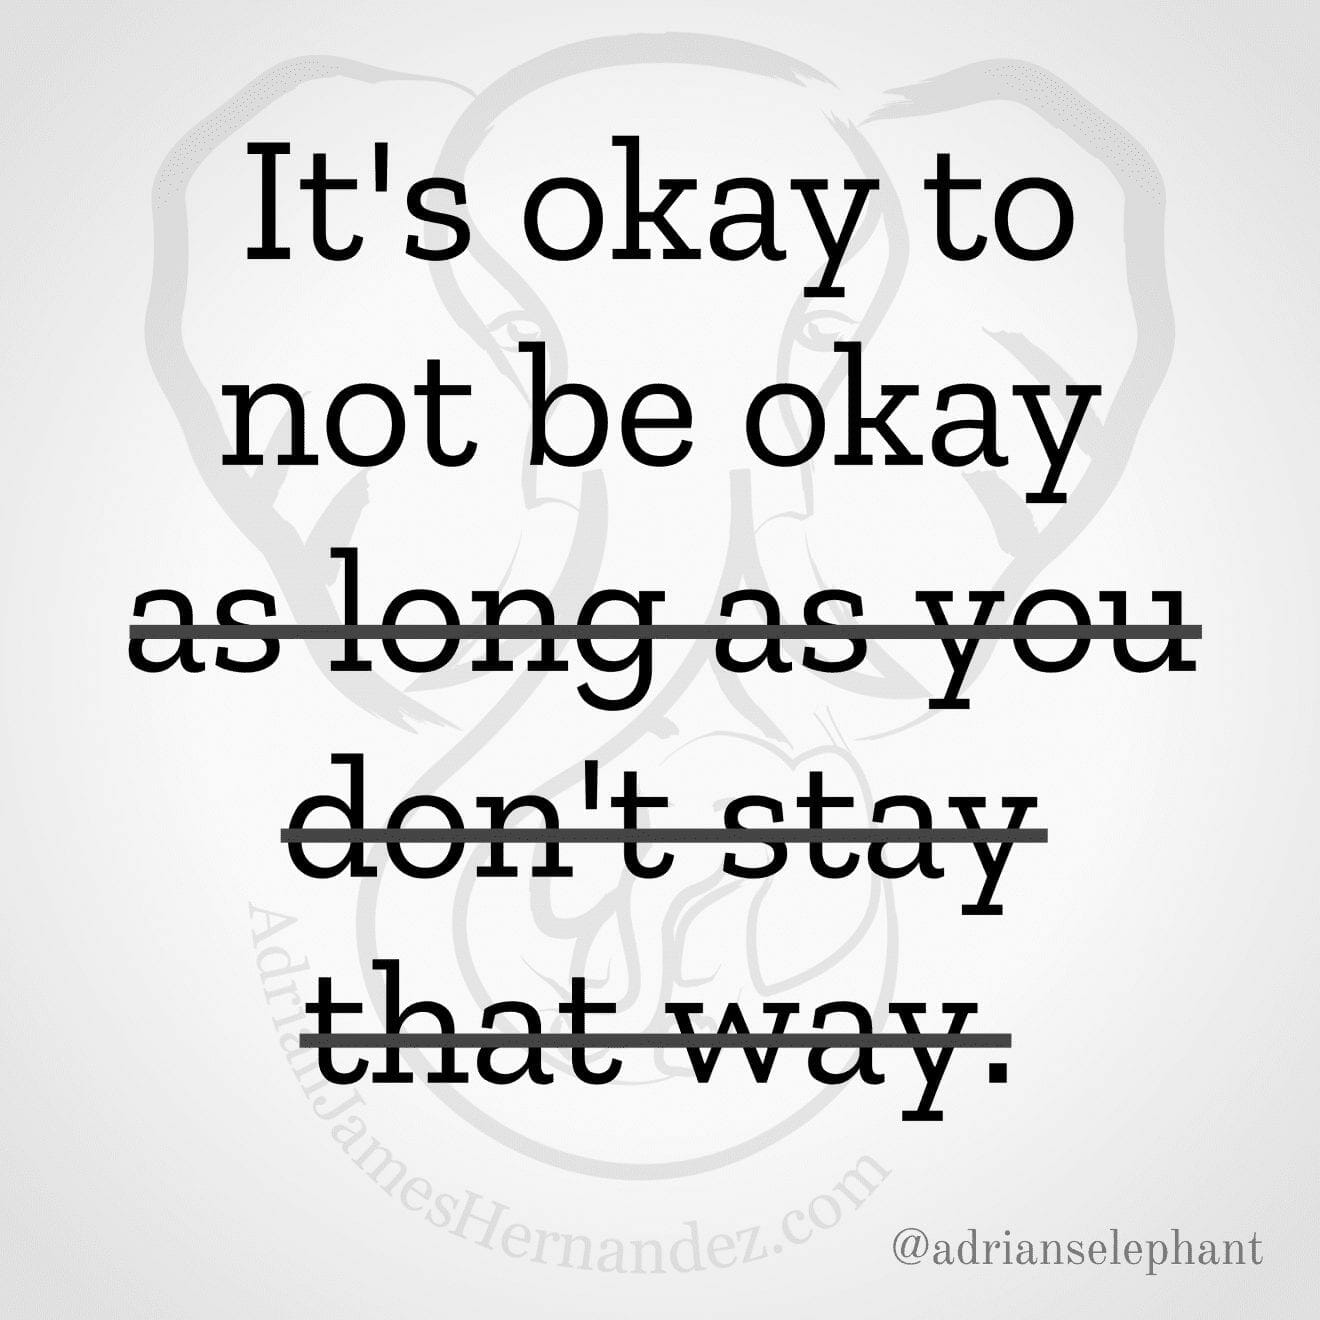 """It's okay to not be okay as long as you don't stay that way"" Rewritten: It's okay to not be okay."